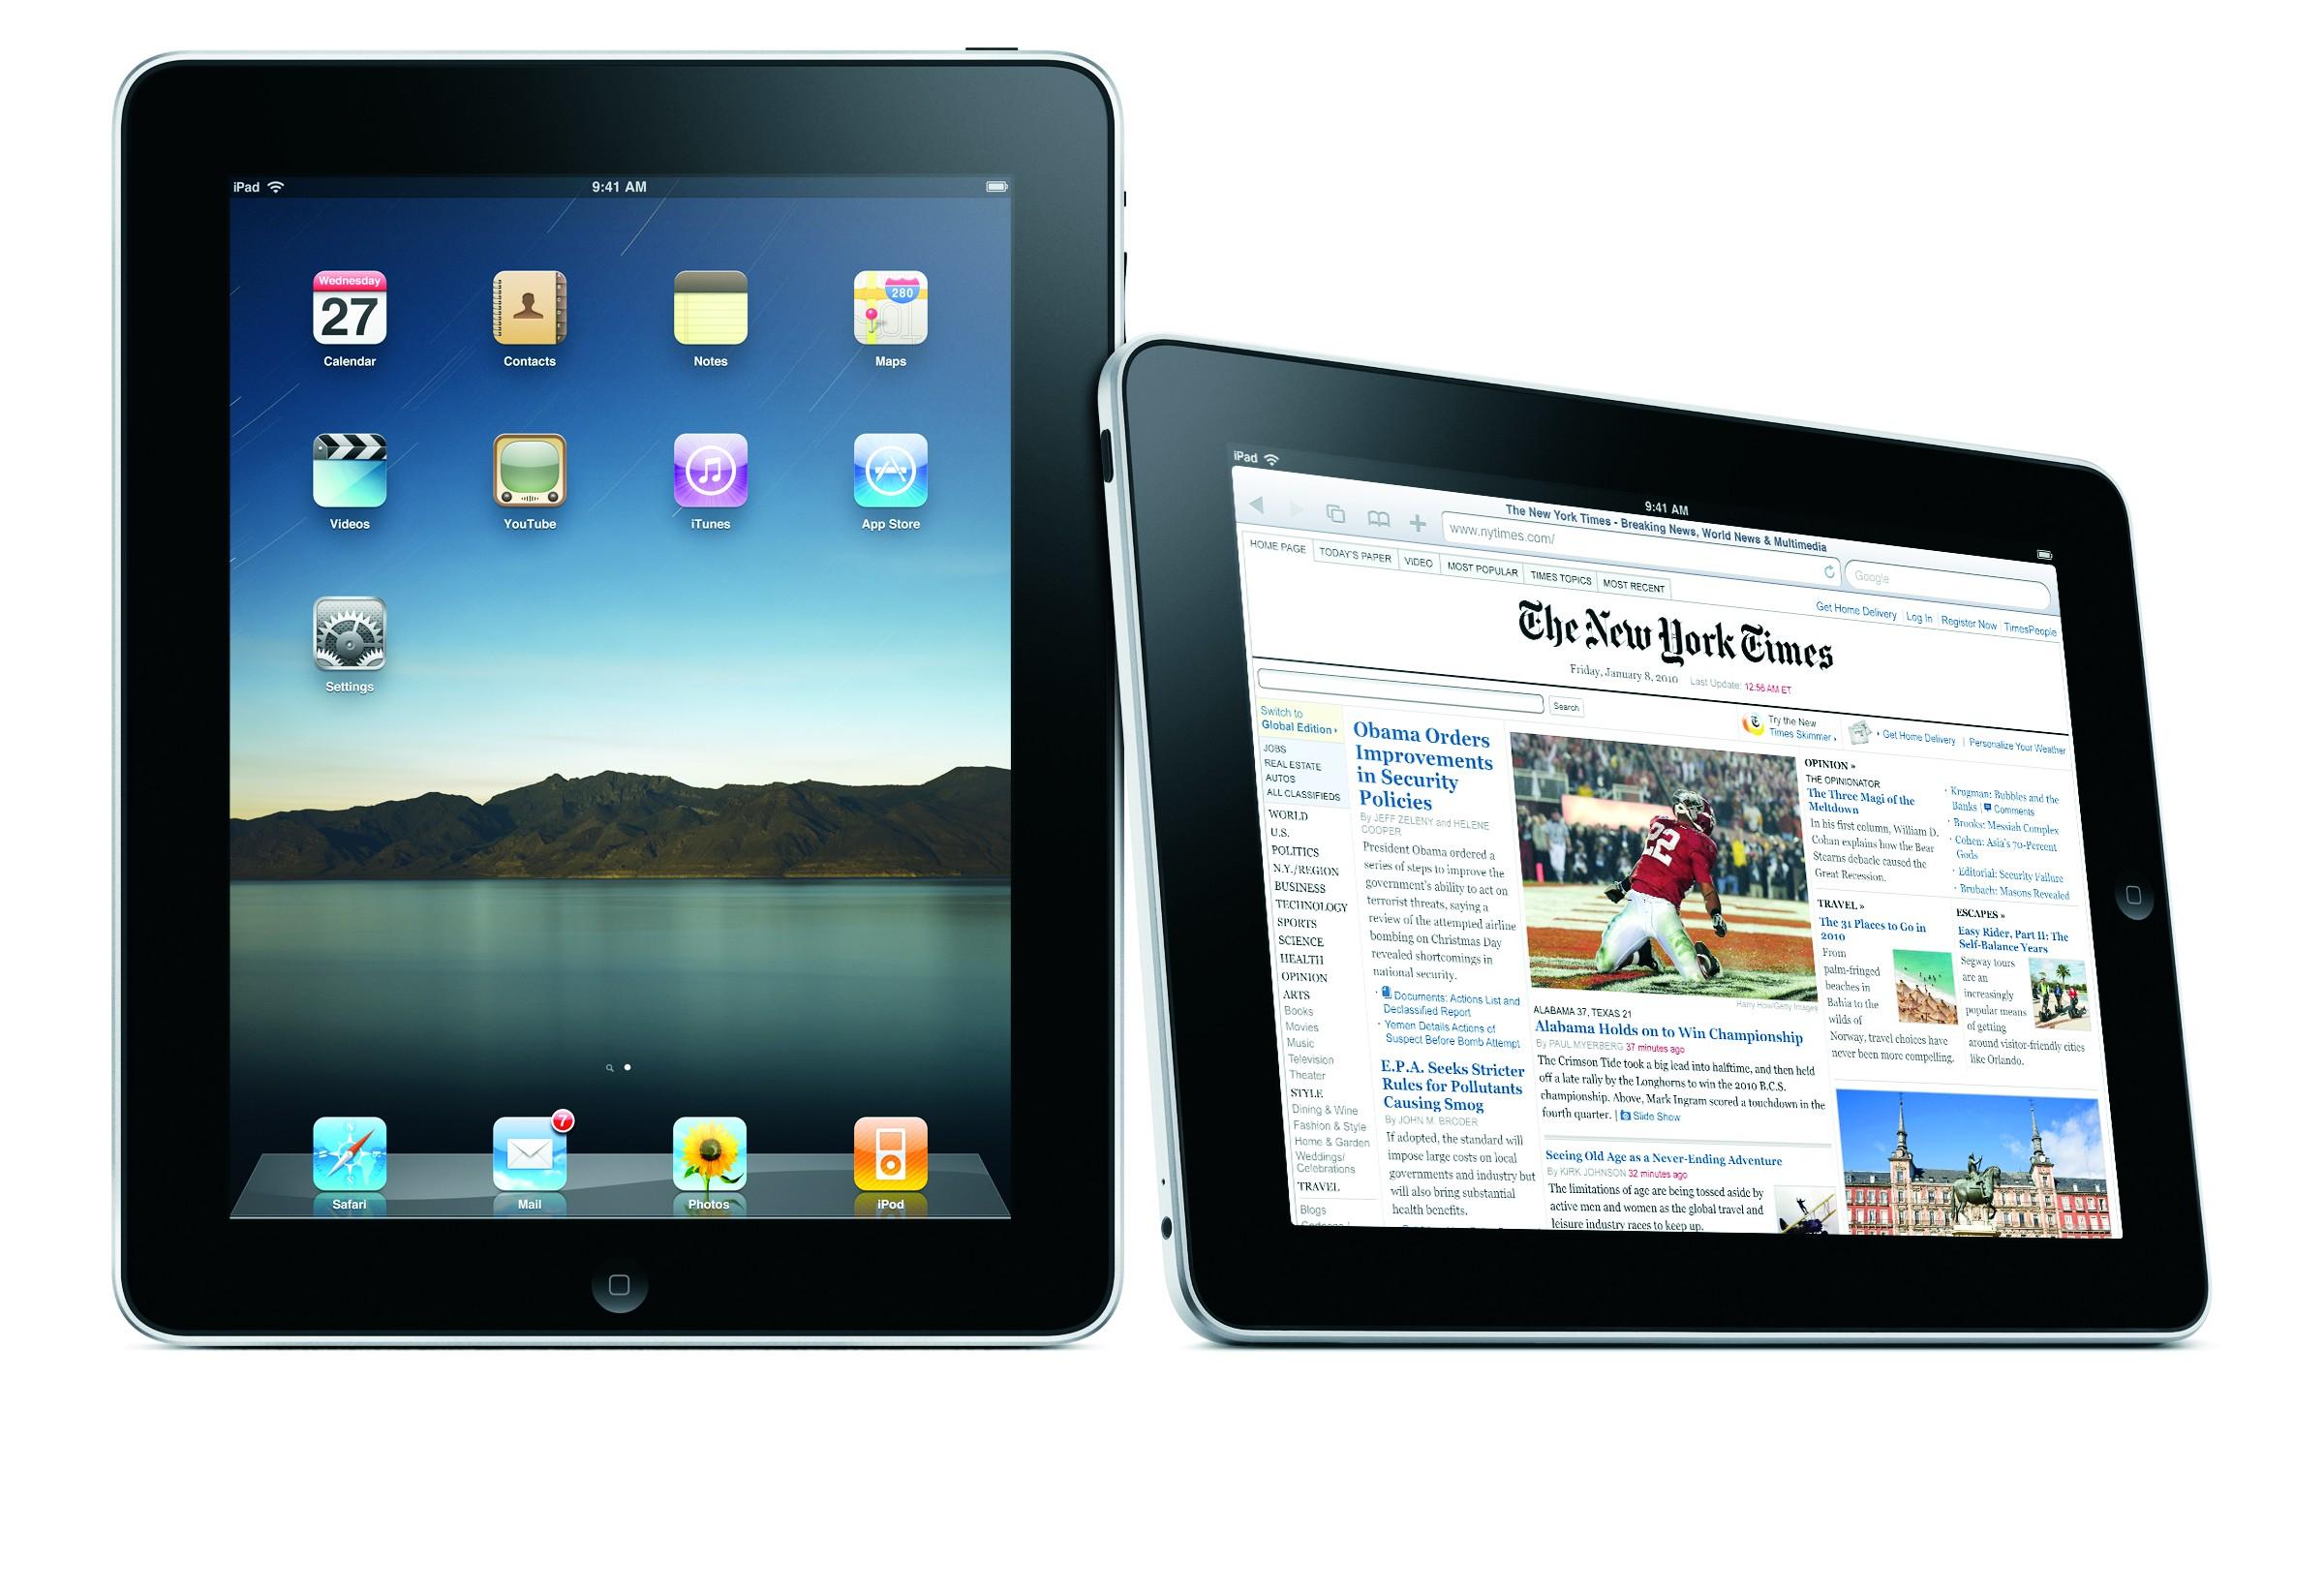 iPad 2 WI-FI 3g 16GB Black With a iPad 2 Black Cover | ClickBD large image 0